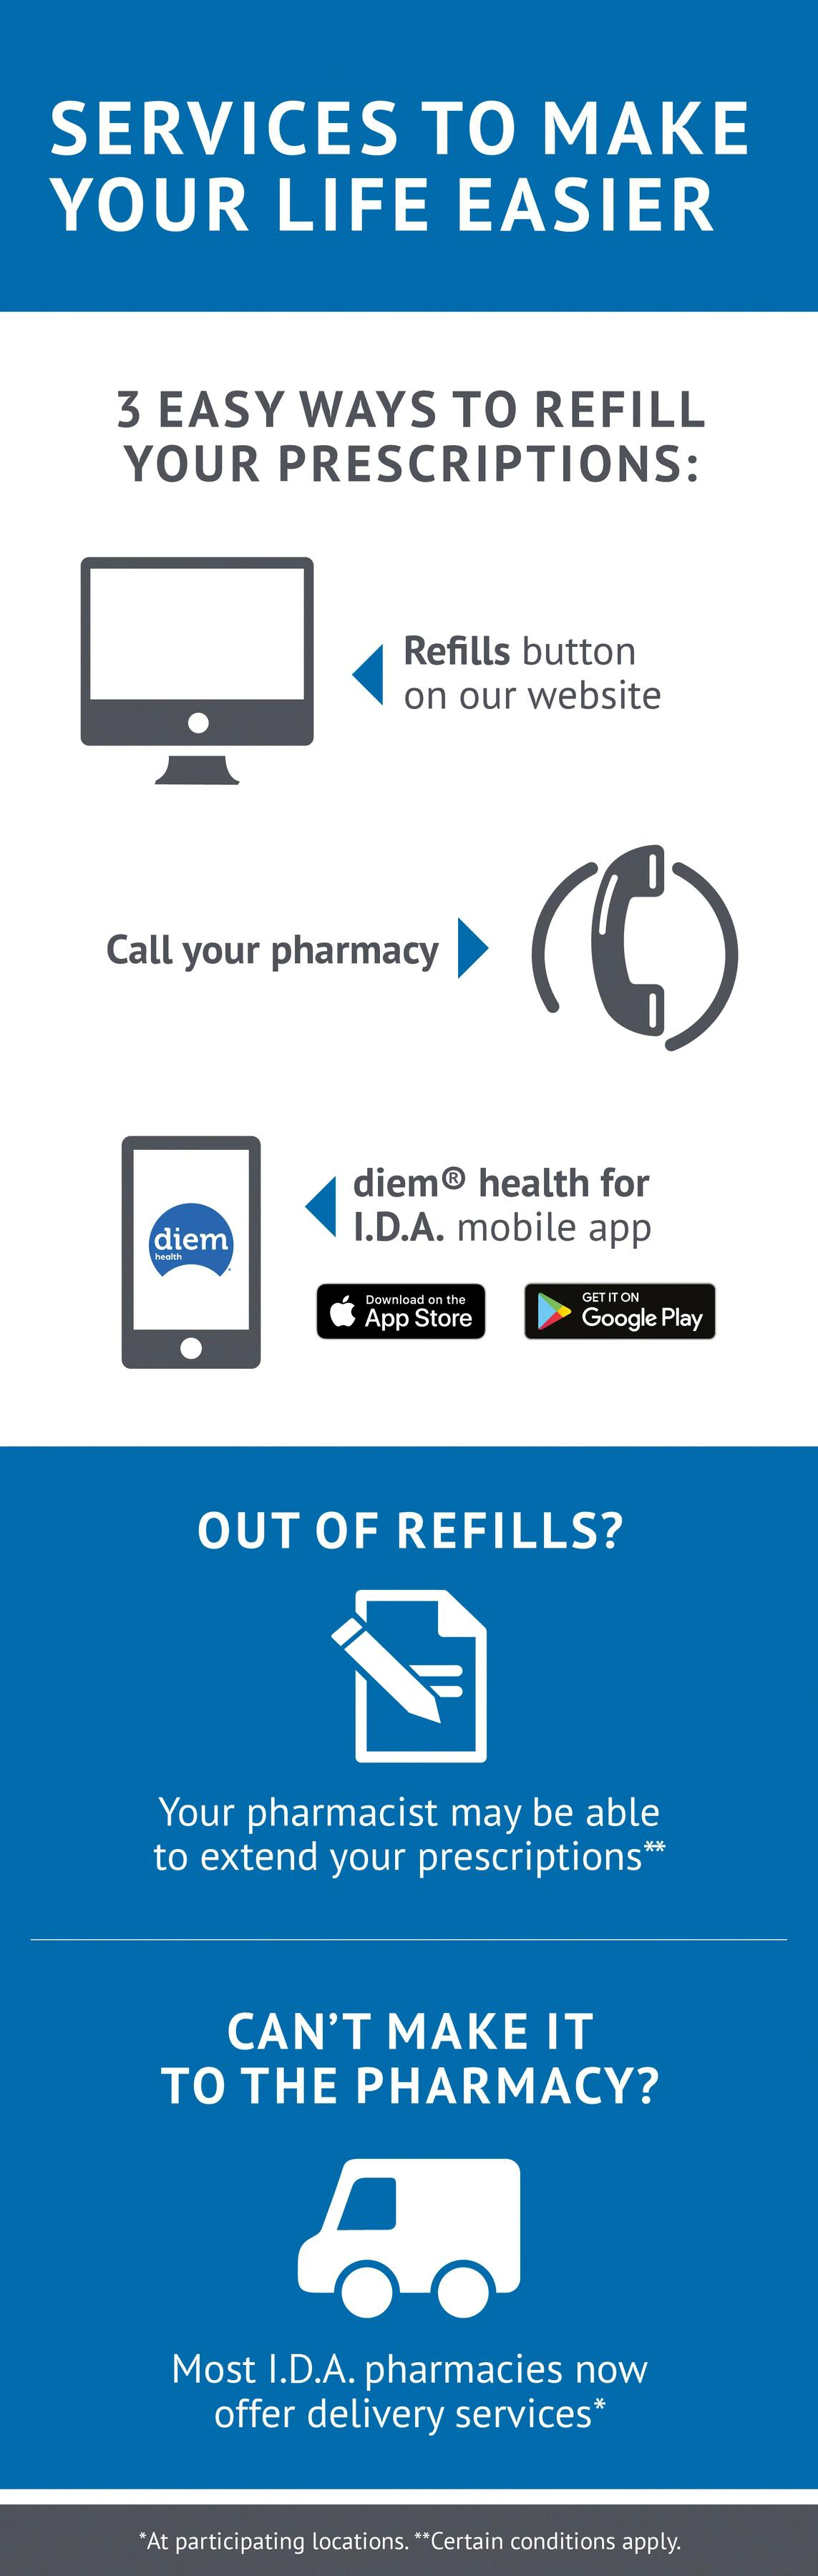 Guardian IDA Pharmacies - Monthly Savings - Page 4